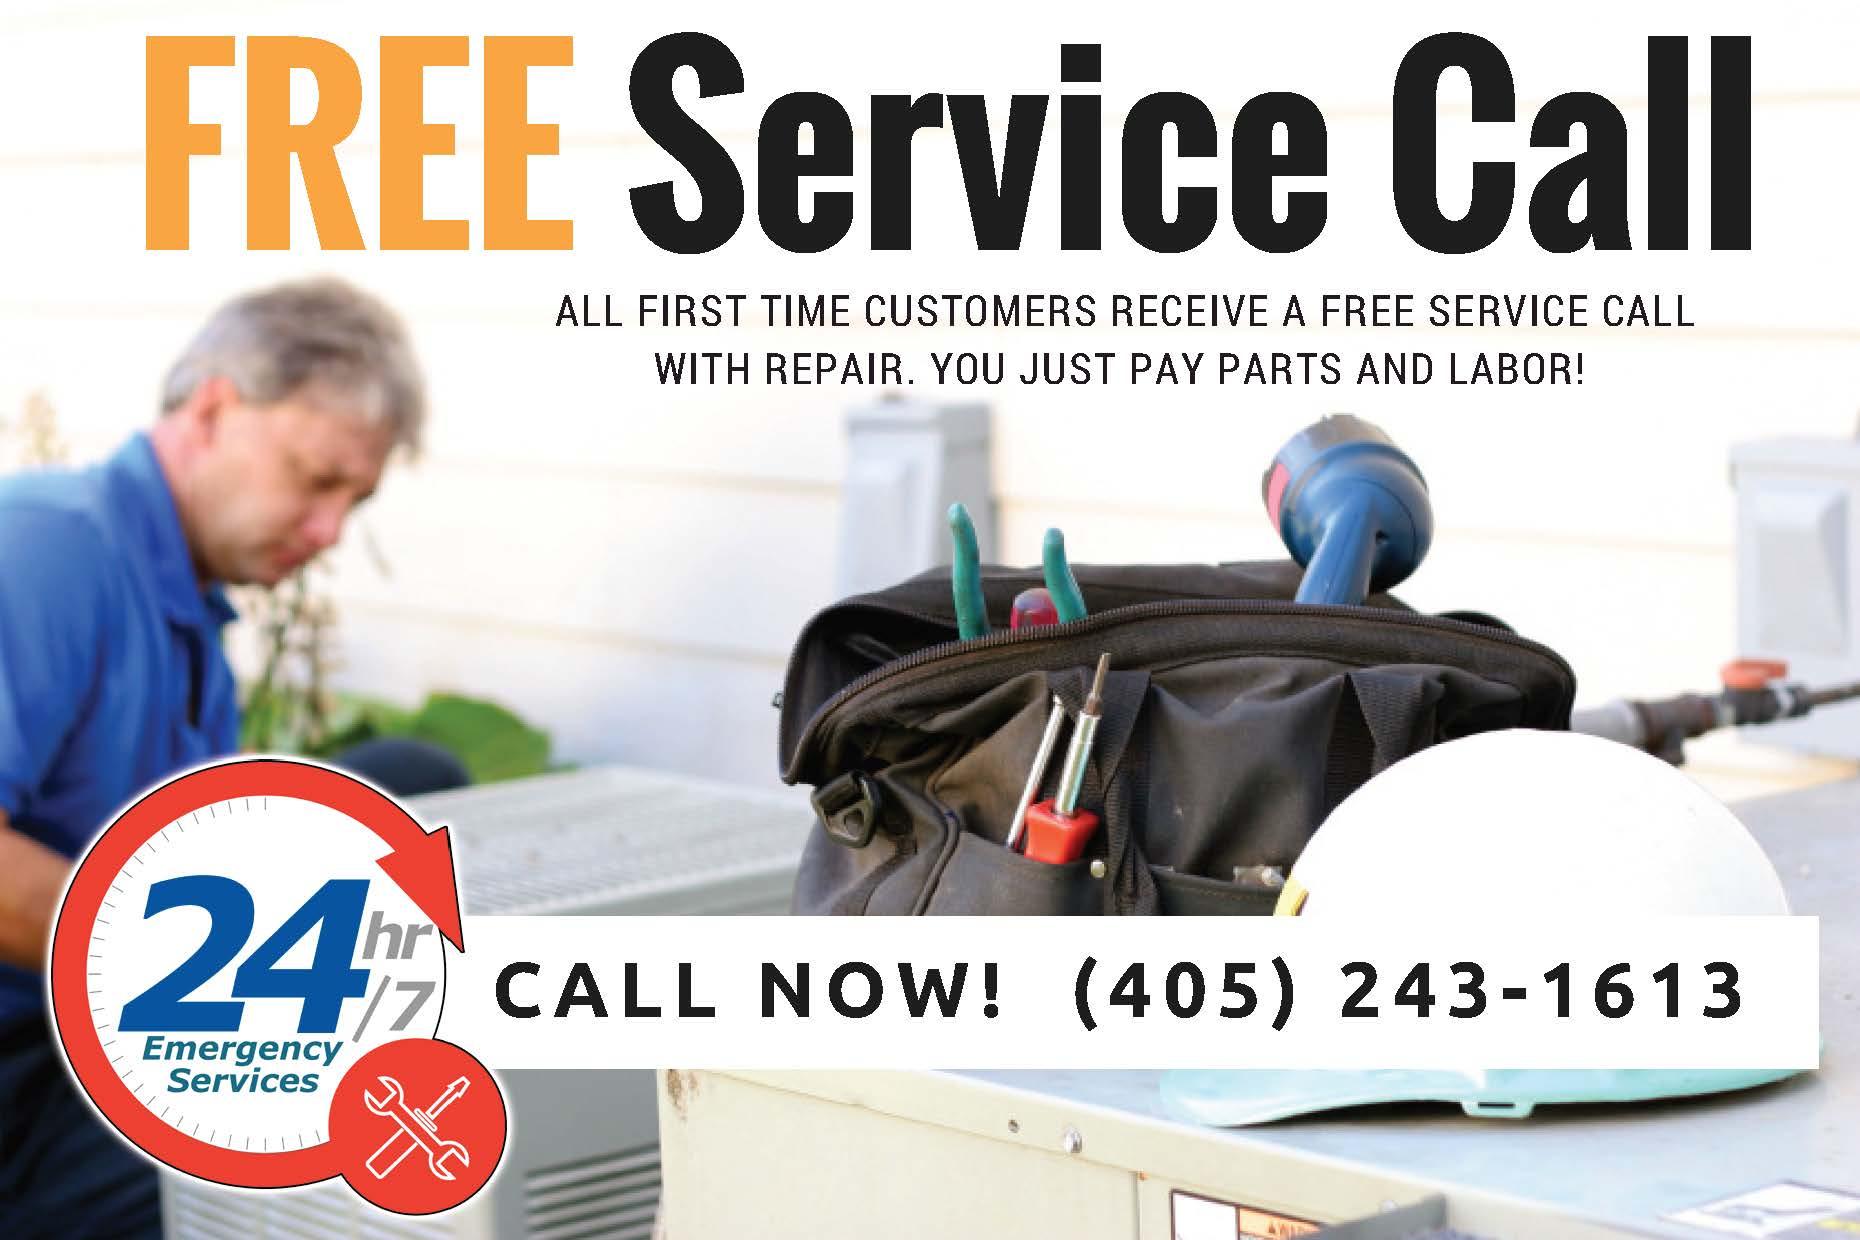 Edmond Free heater or furnace Service Call